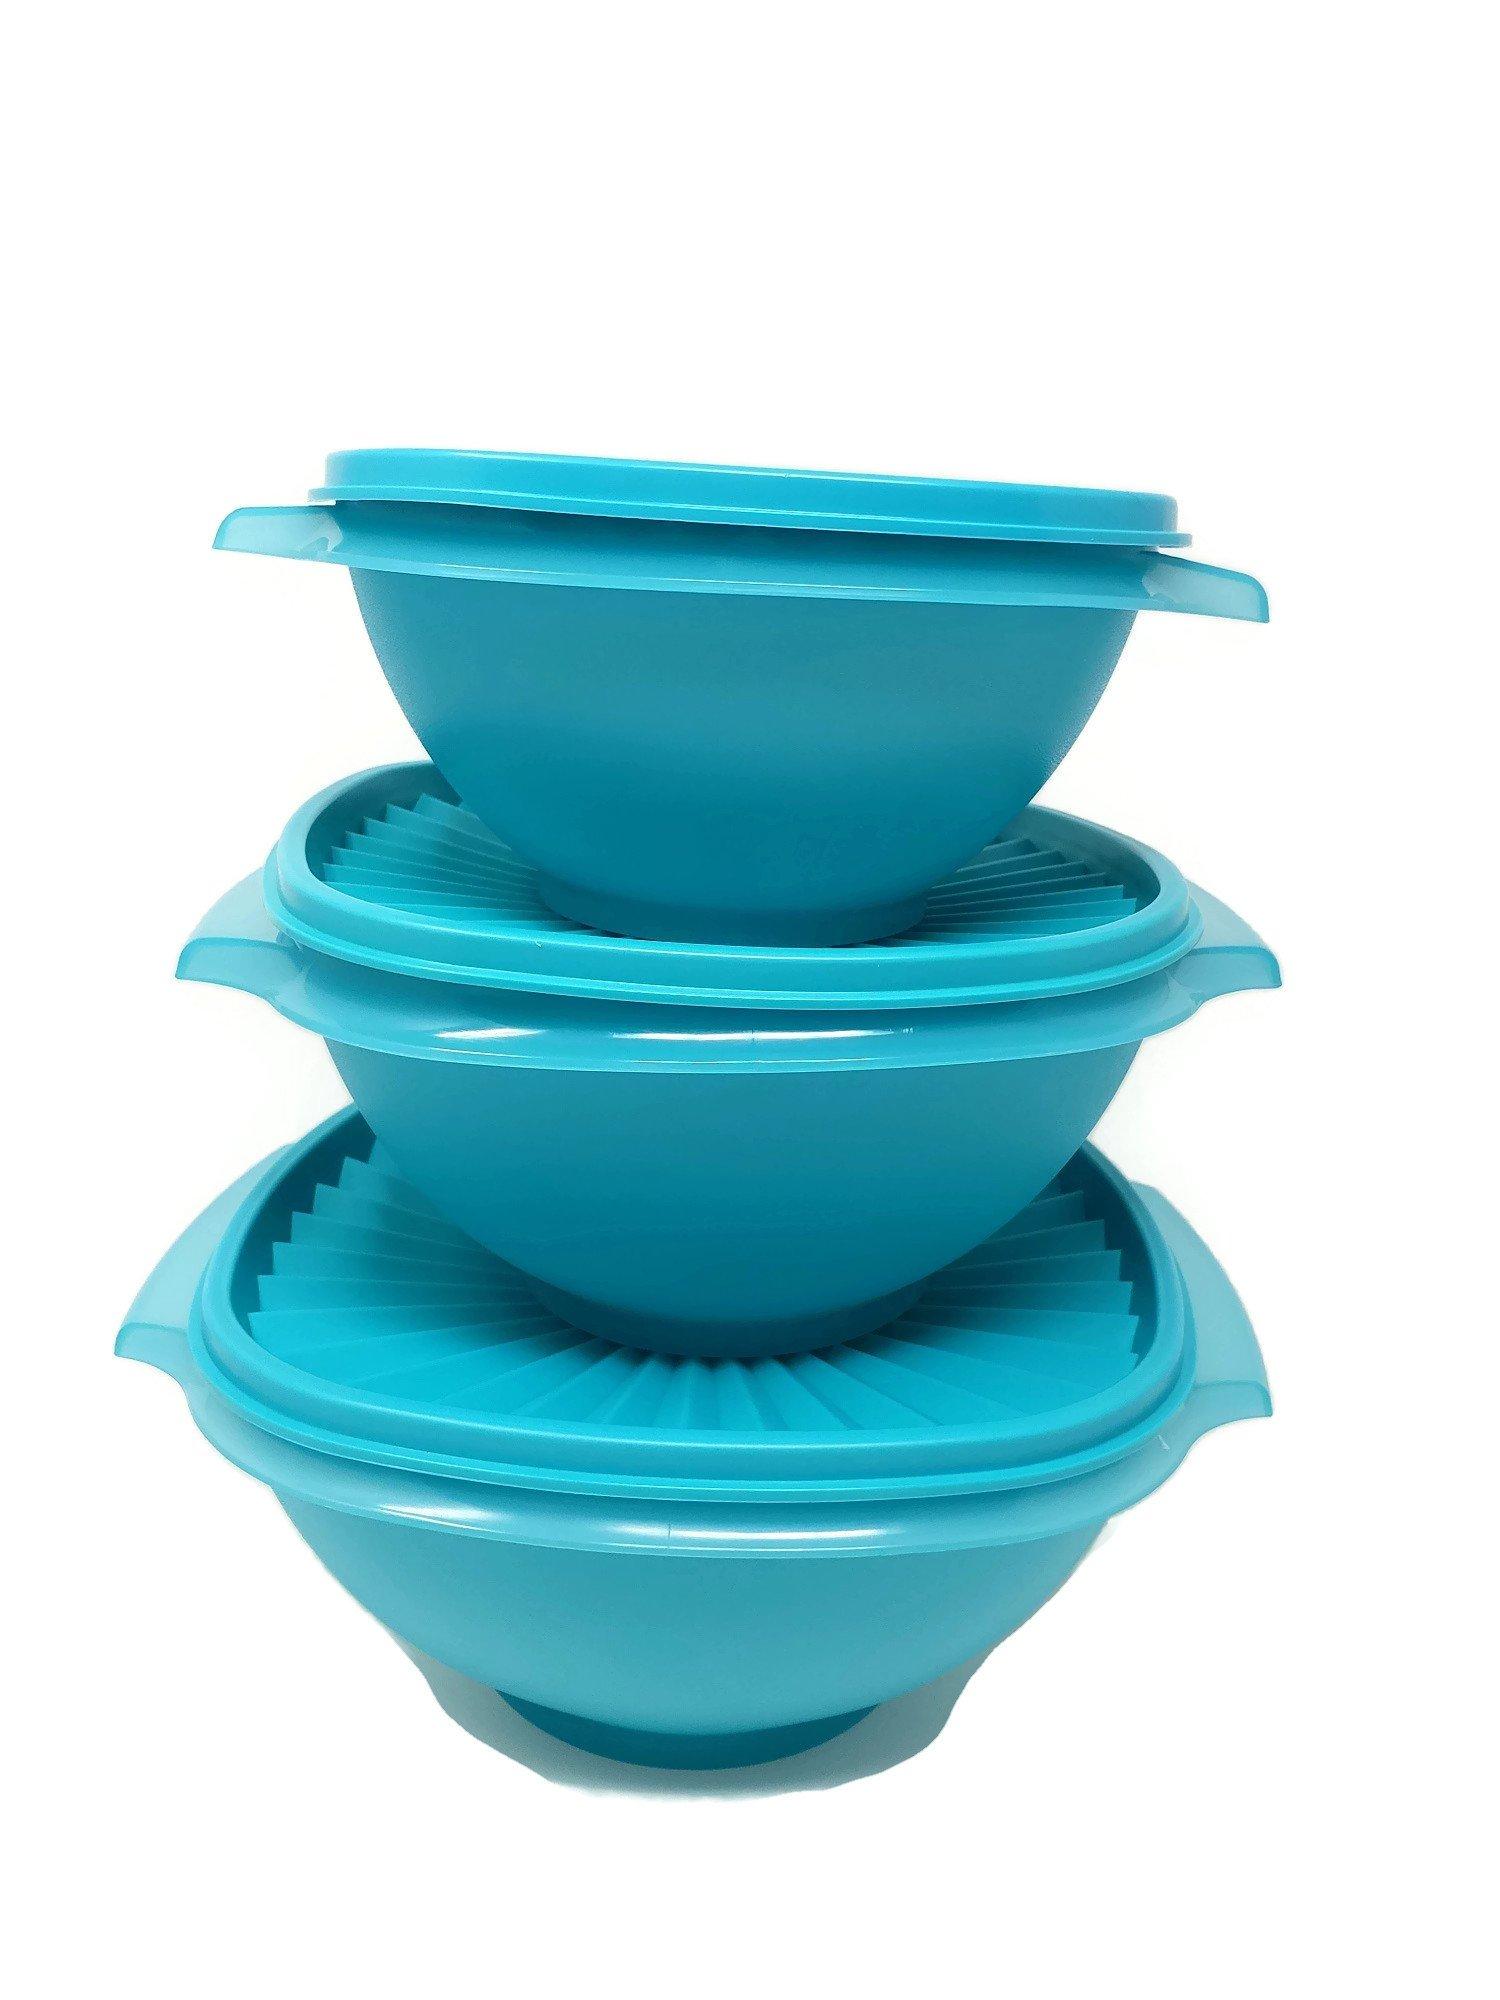 Tupperware Servalier 3 pc. bowl set